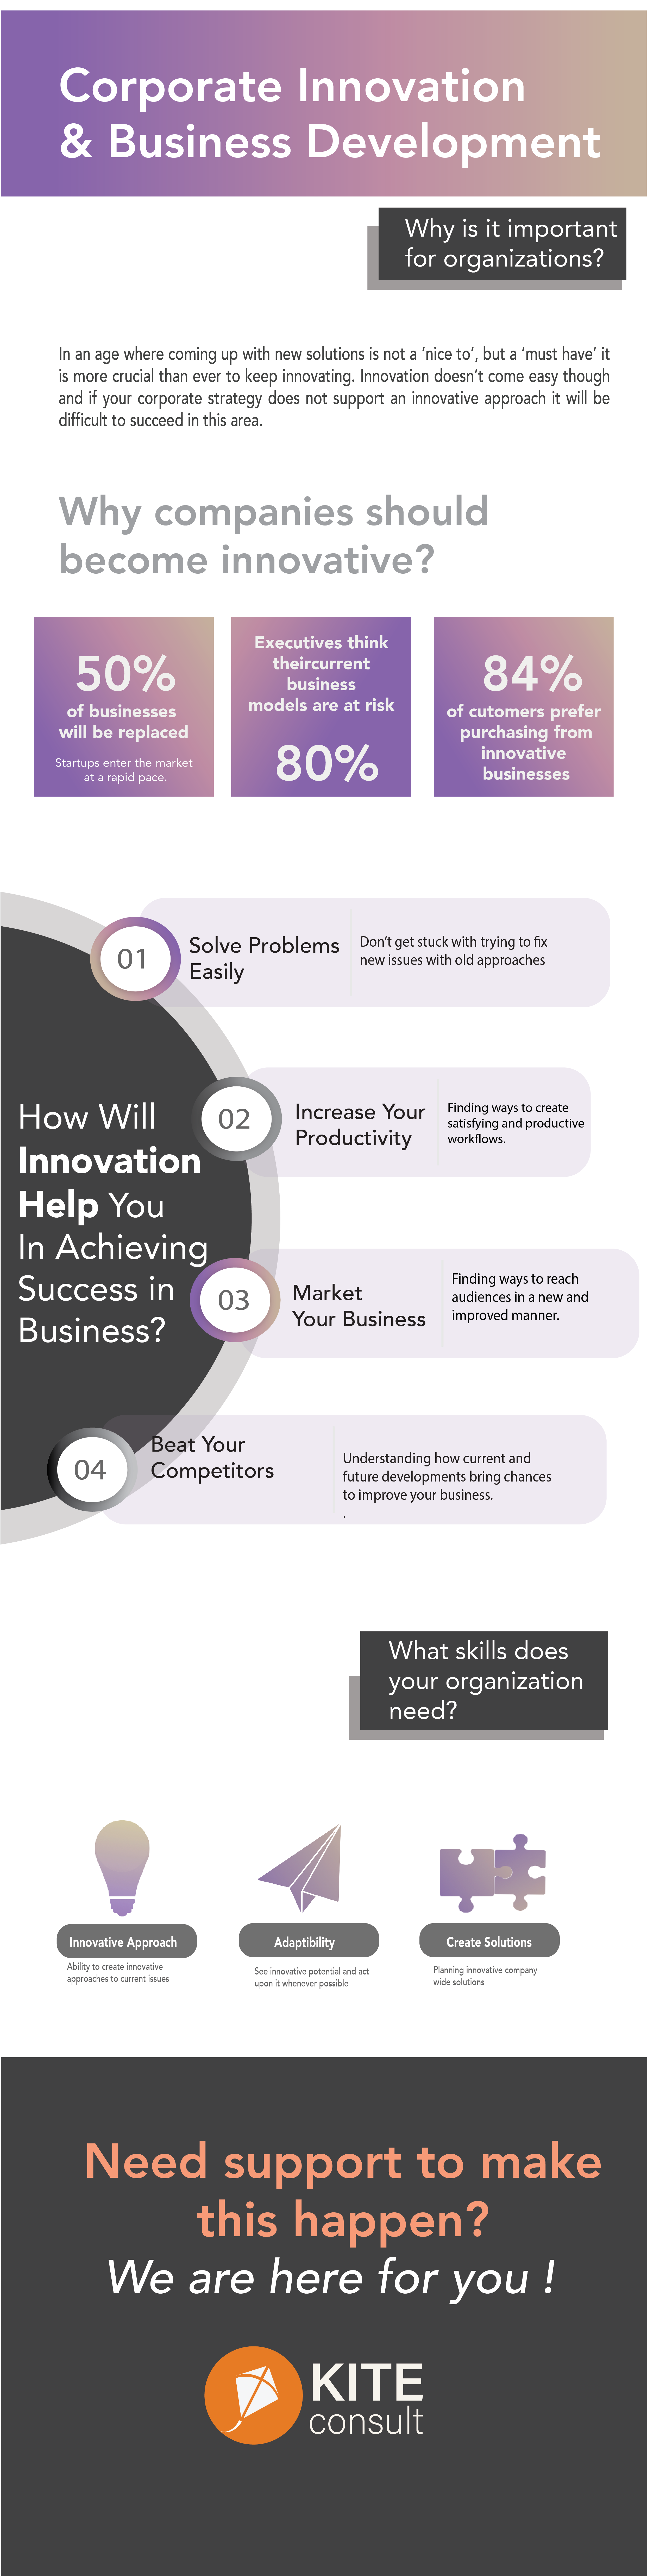 Corporate Innovation Business Development